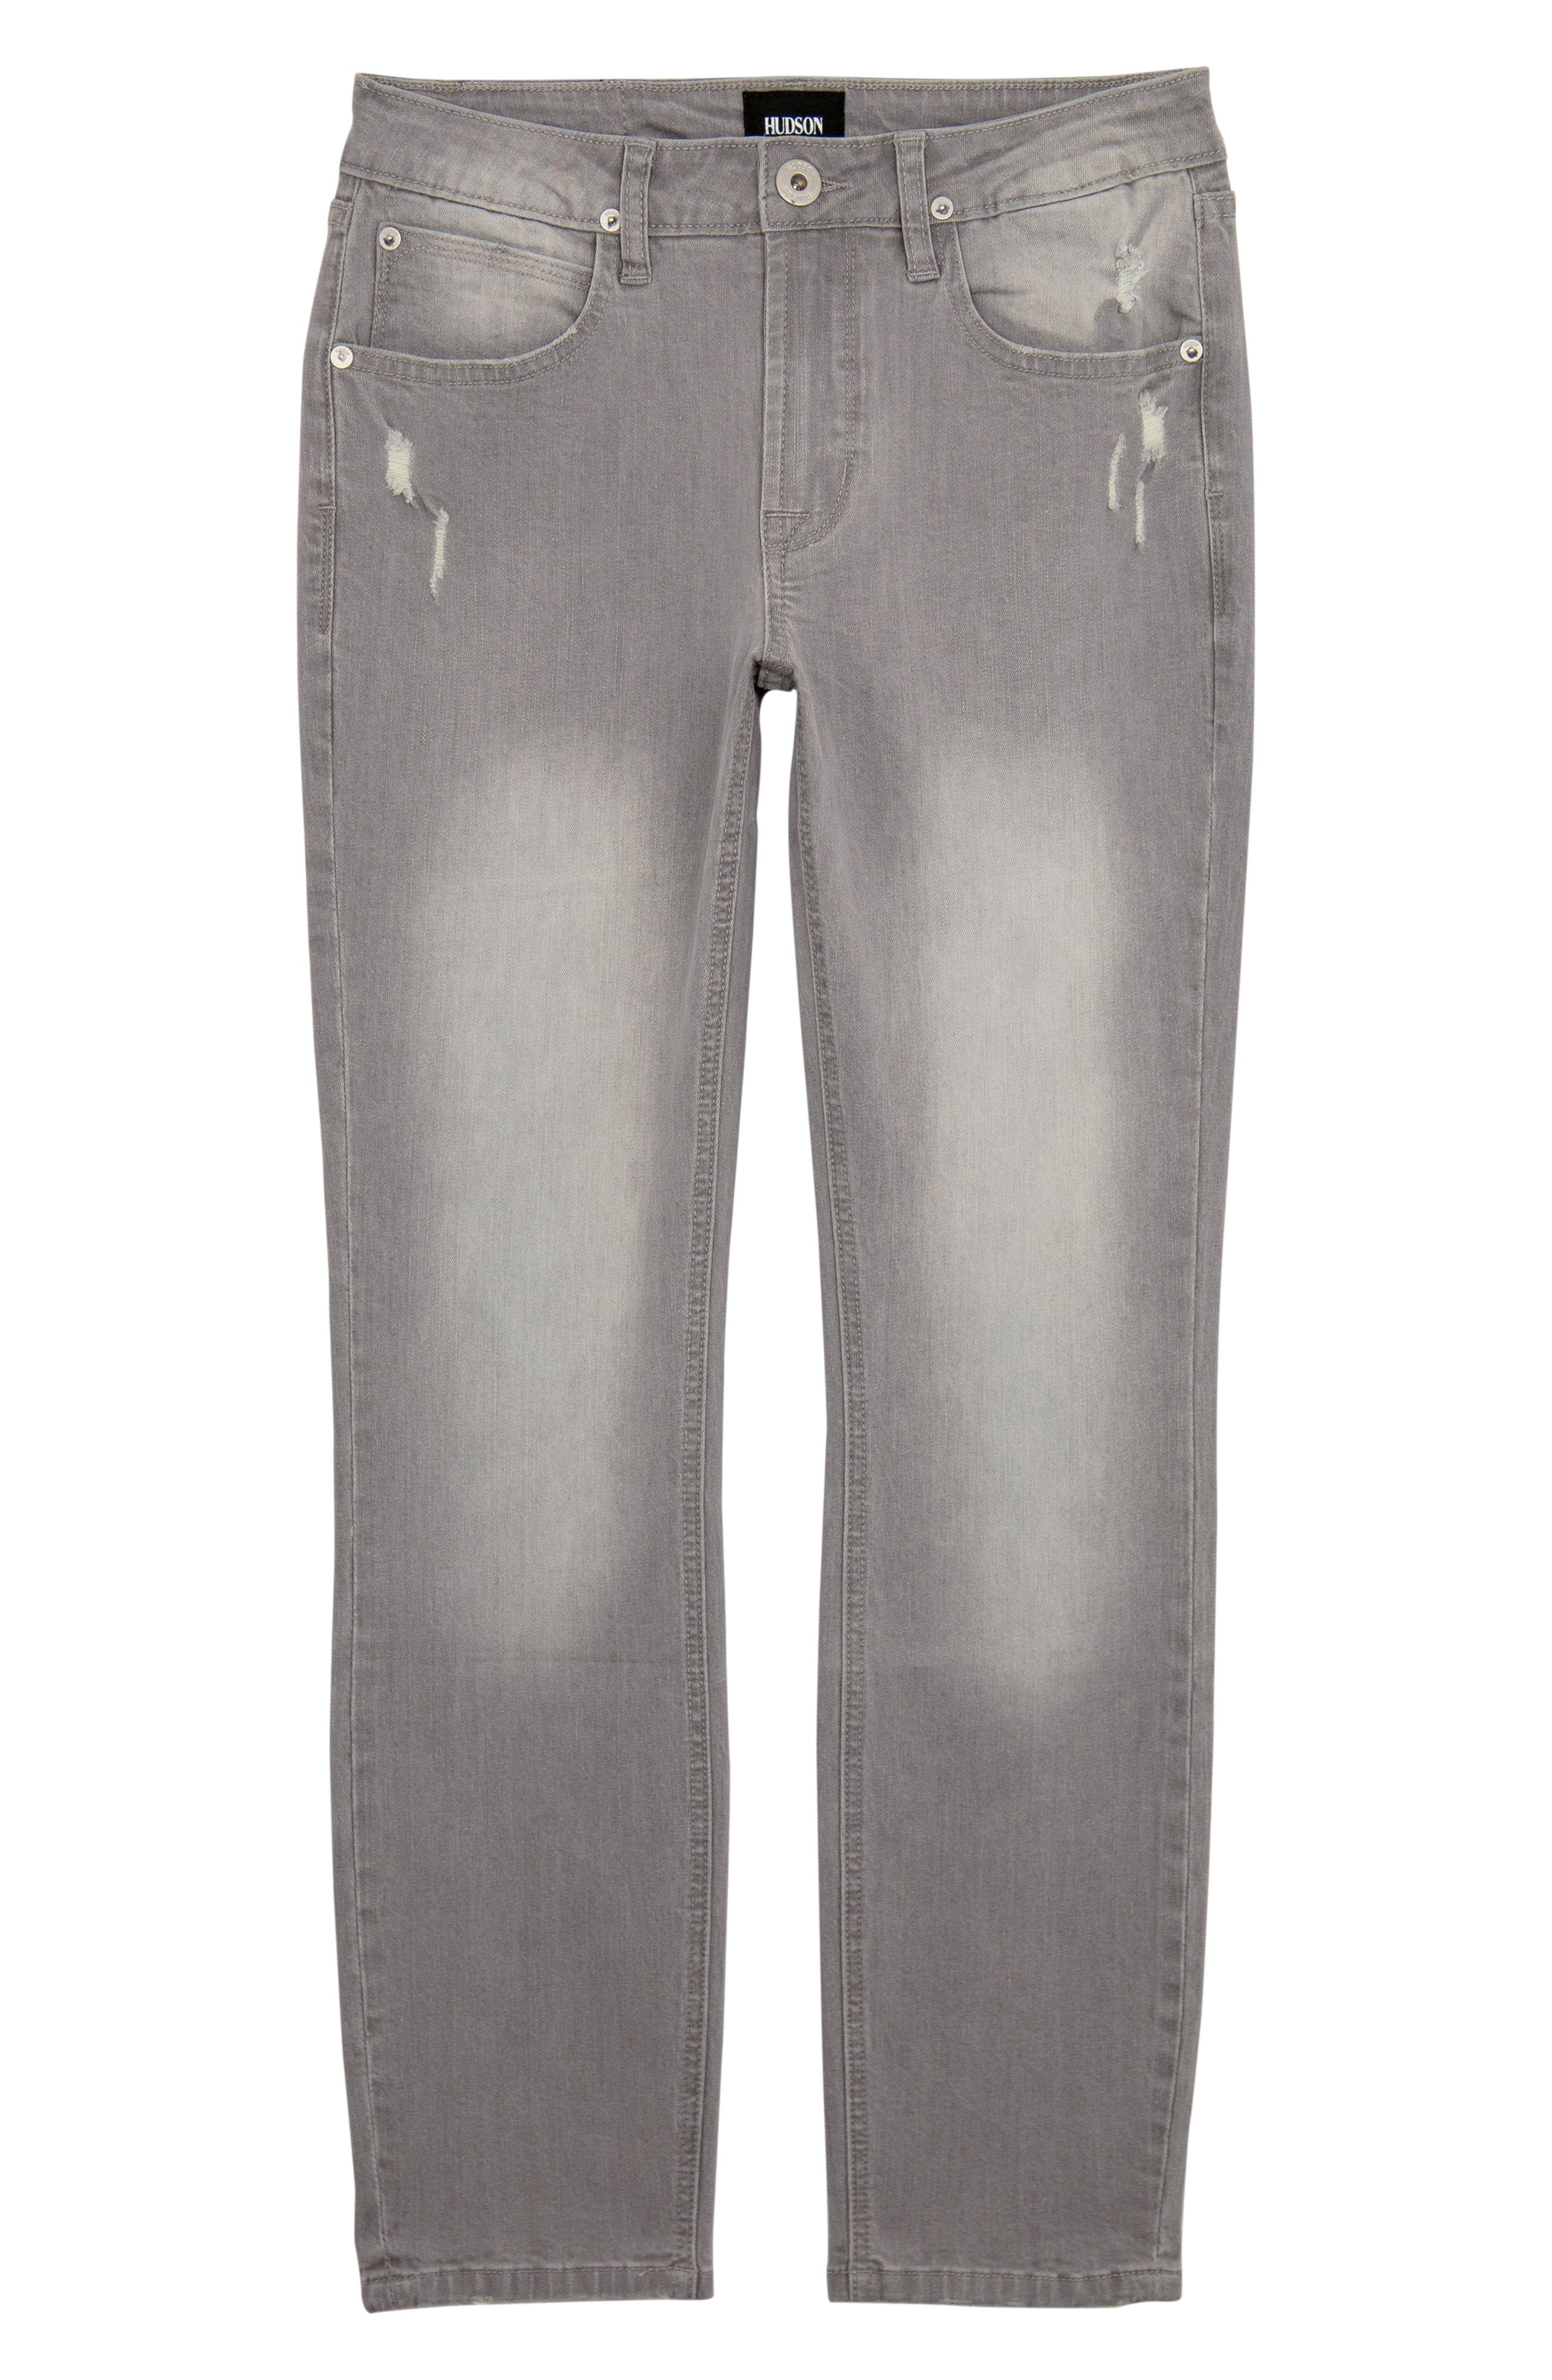 Toddler Boys Hudson Kids Straight Leg Jeans Size 3T  Grey